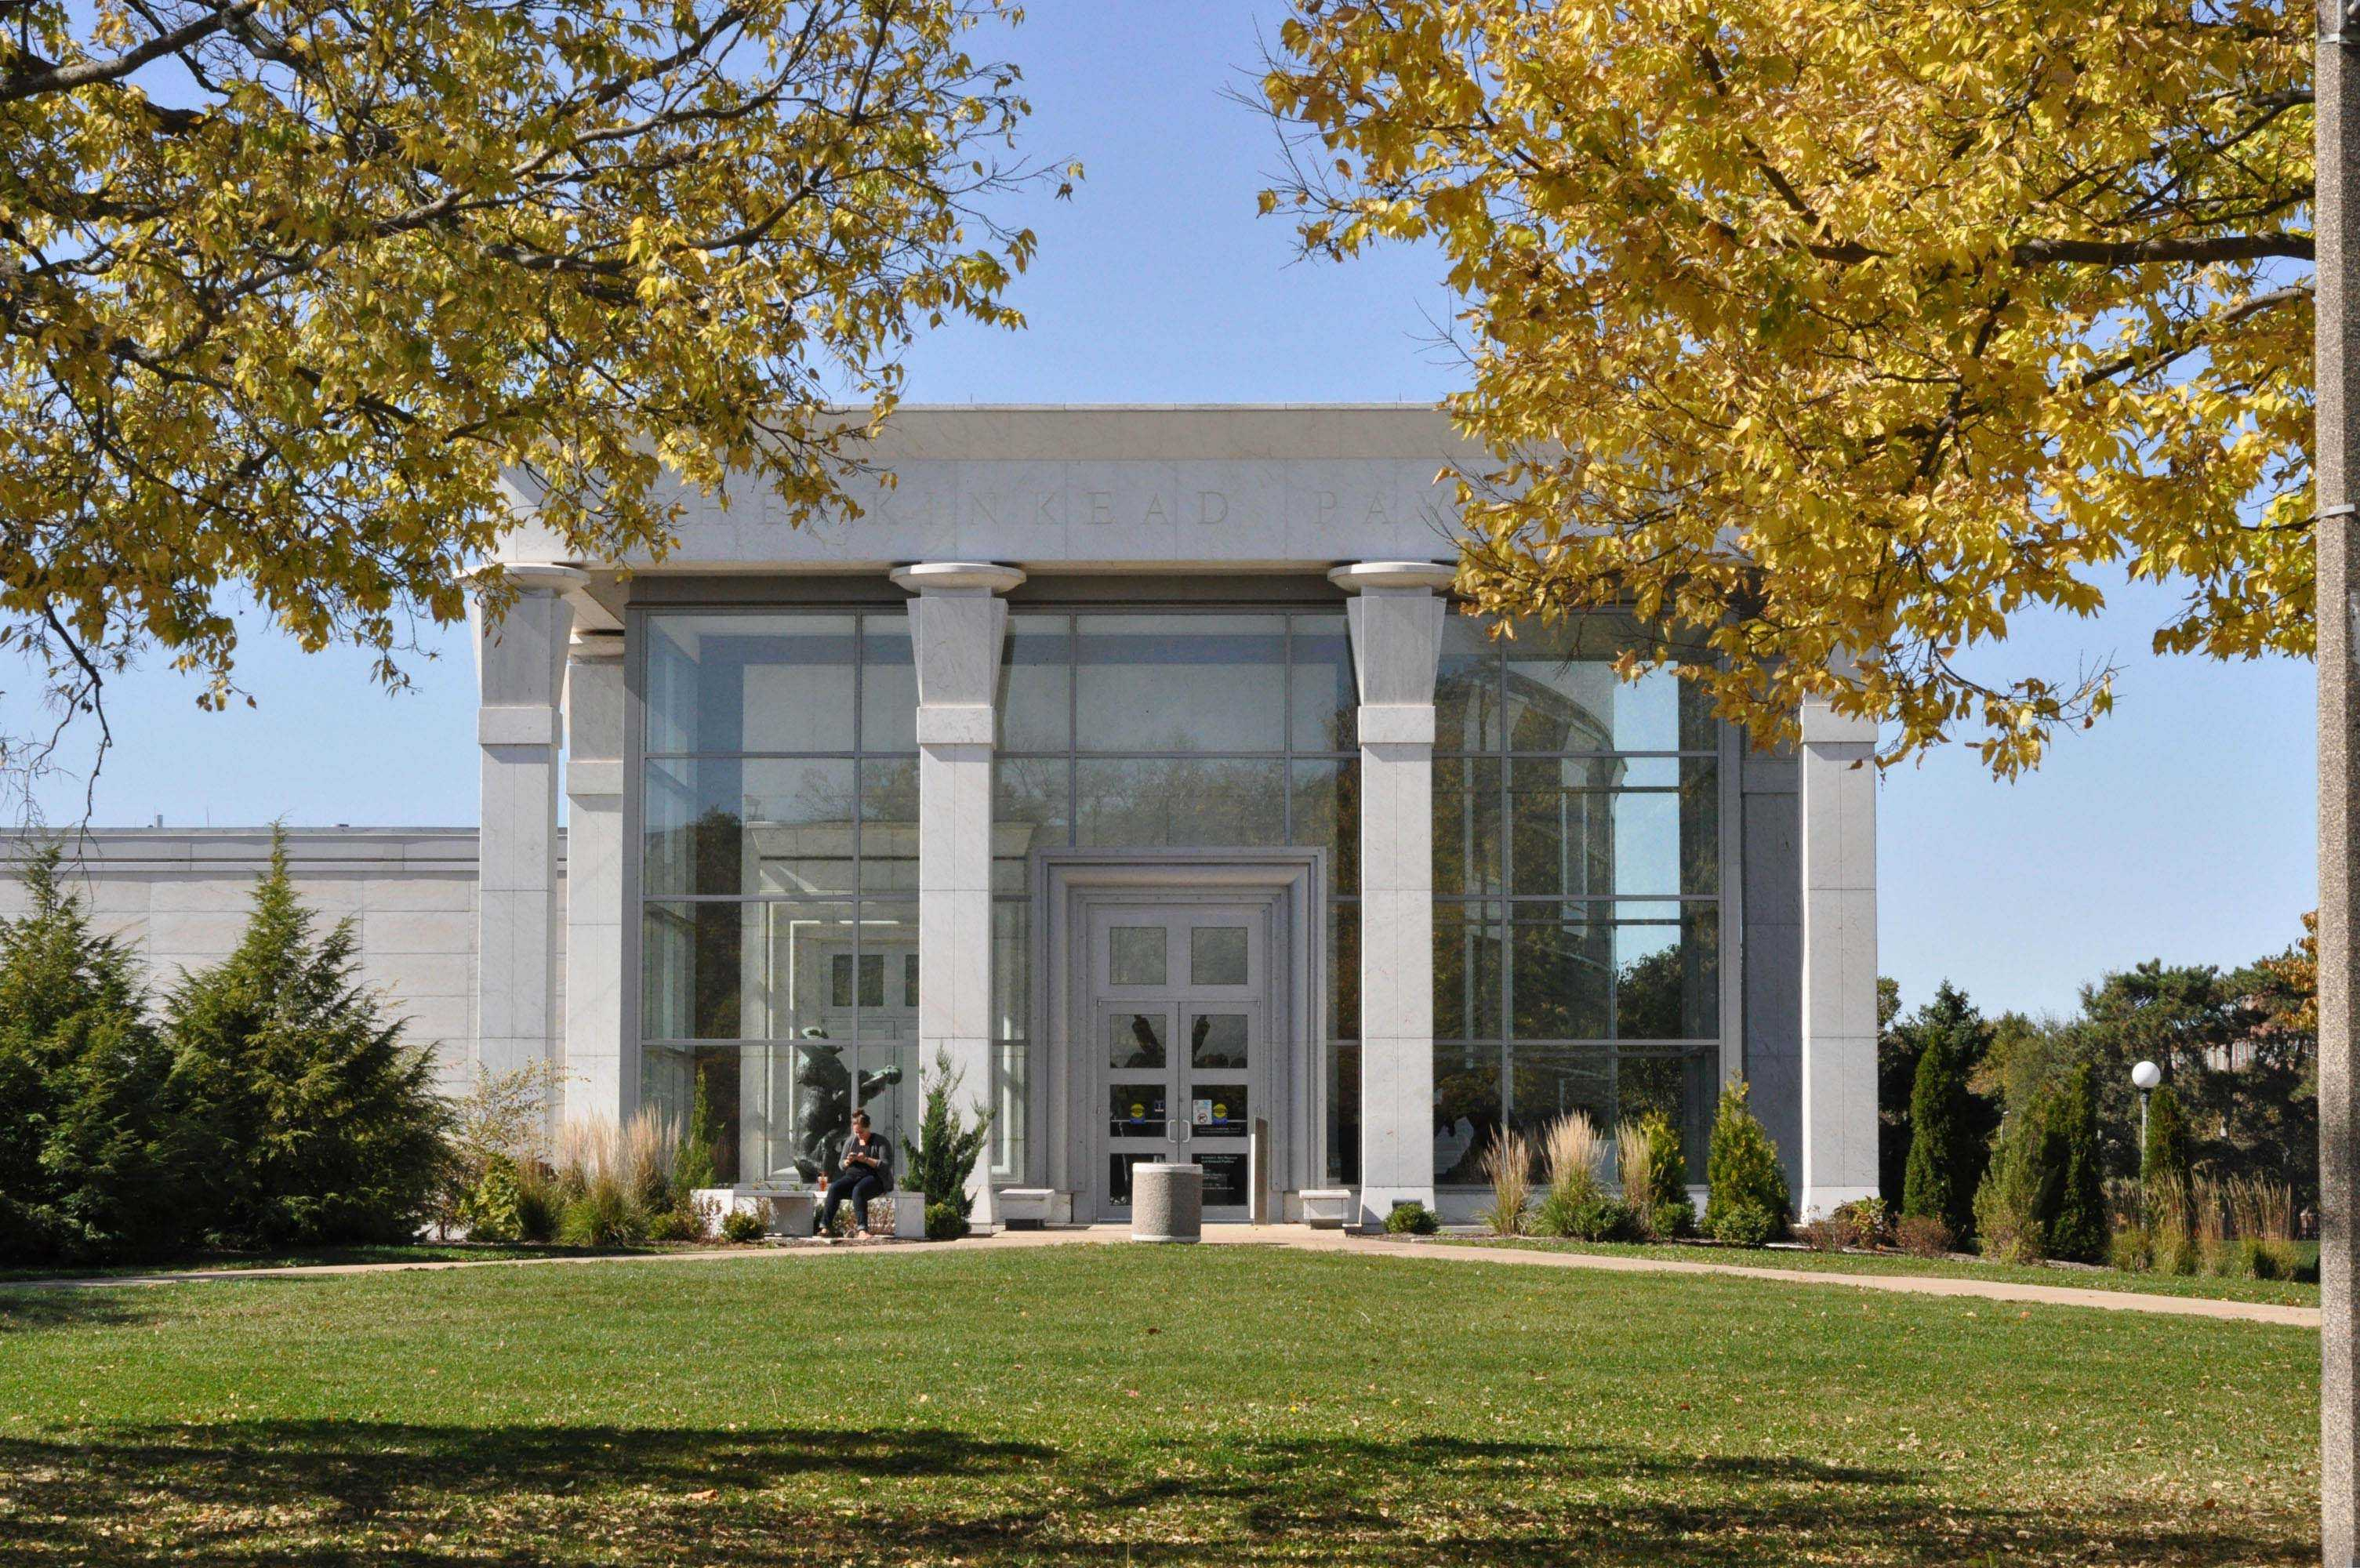 Kannert Art Museum - Champaign, IL